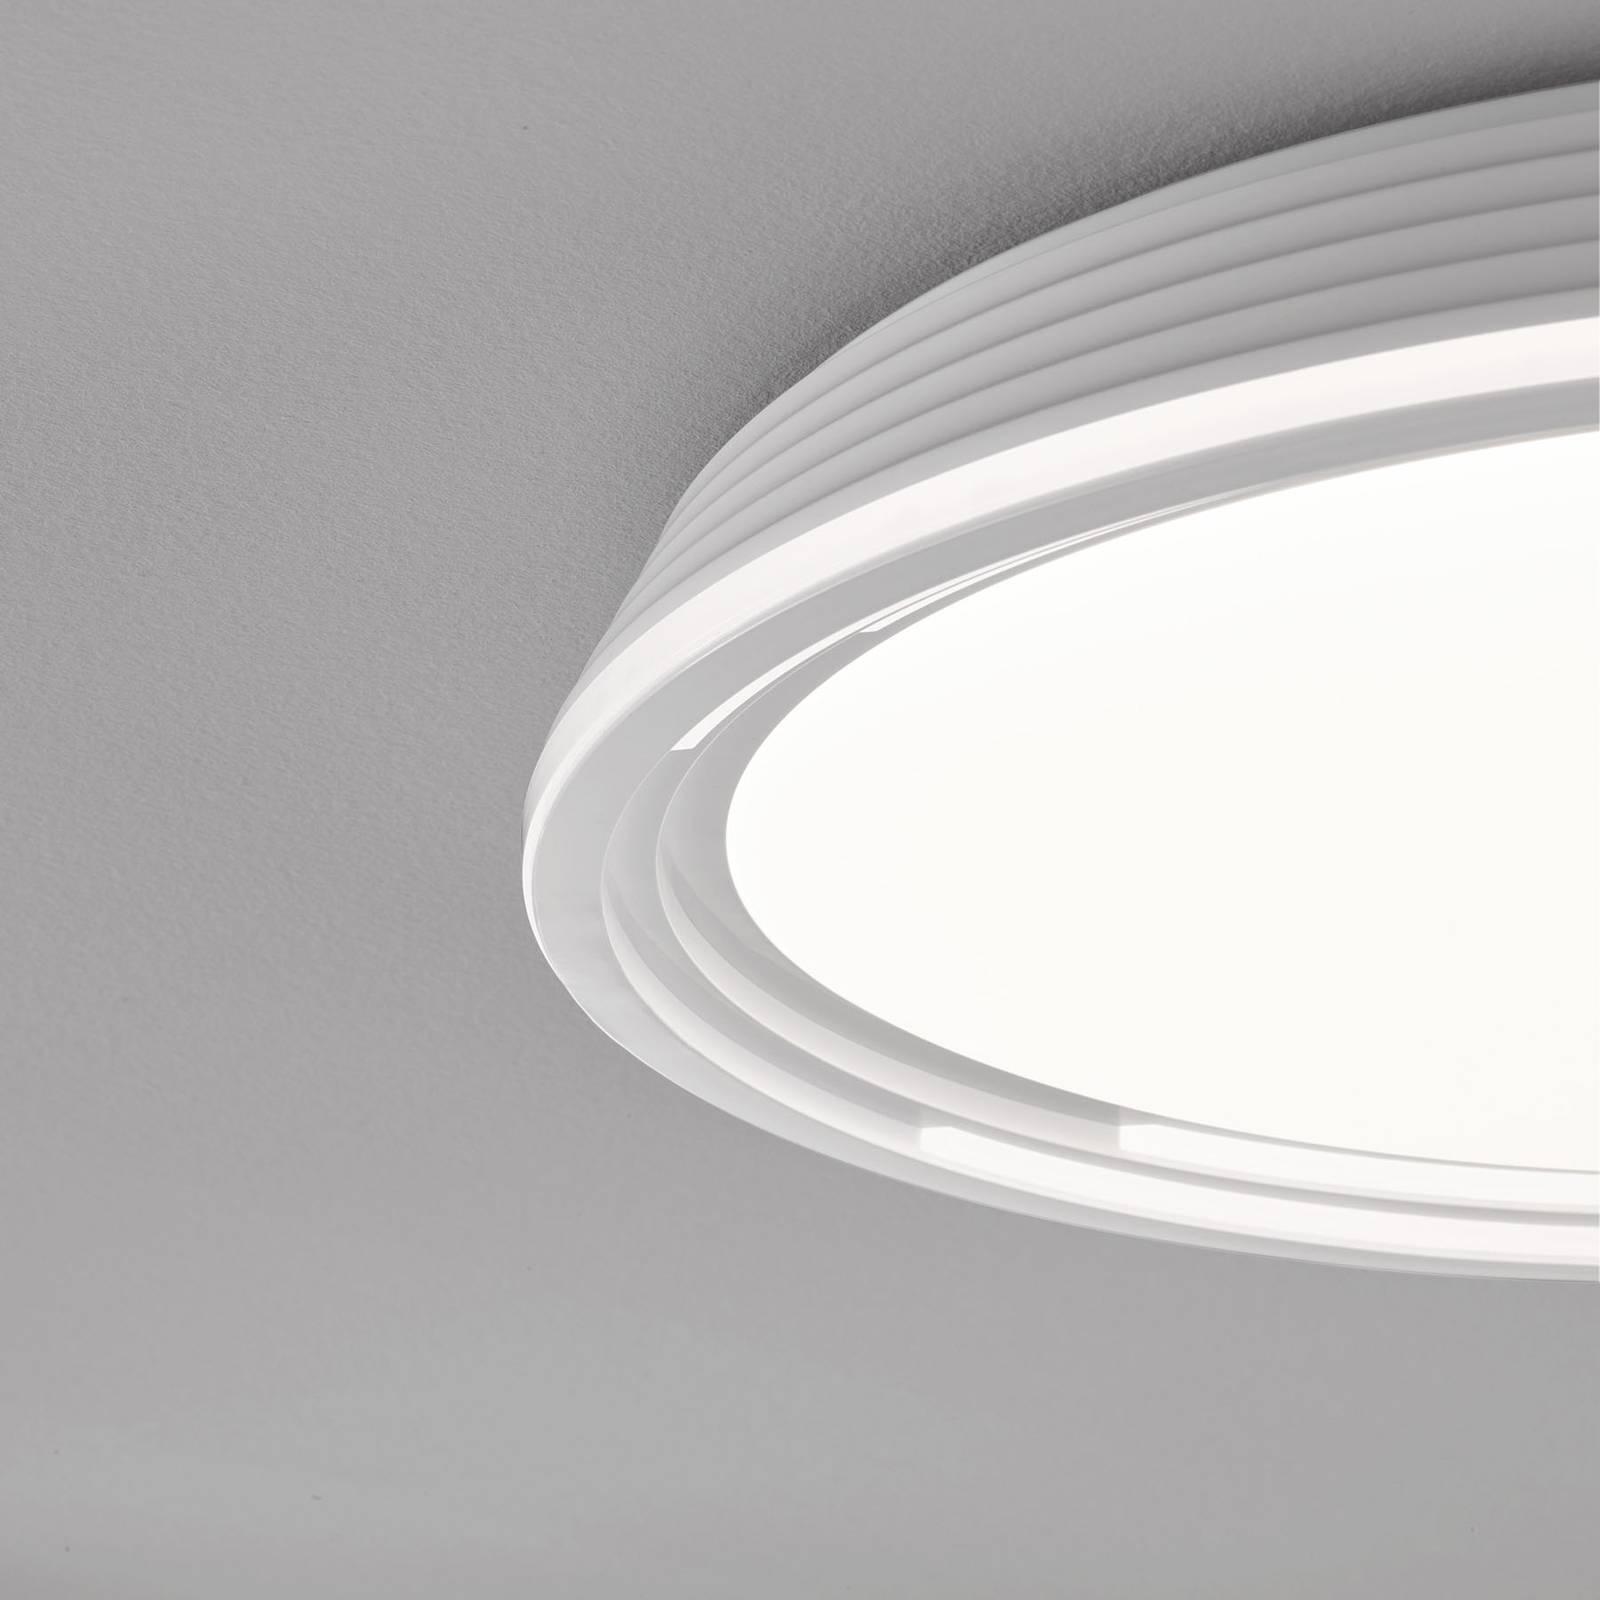 Lampa sufitowa LED Dua, ściemniana, Ø 43 cm